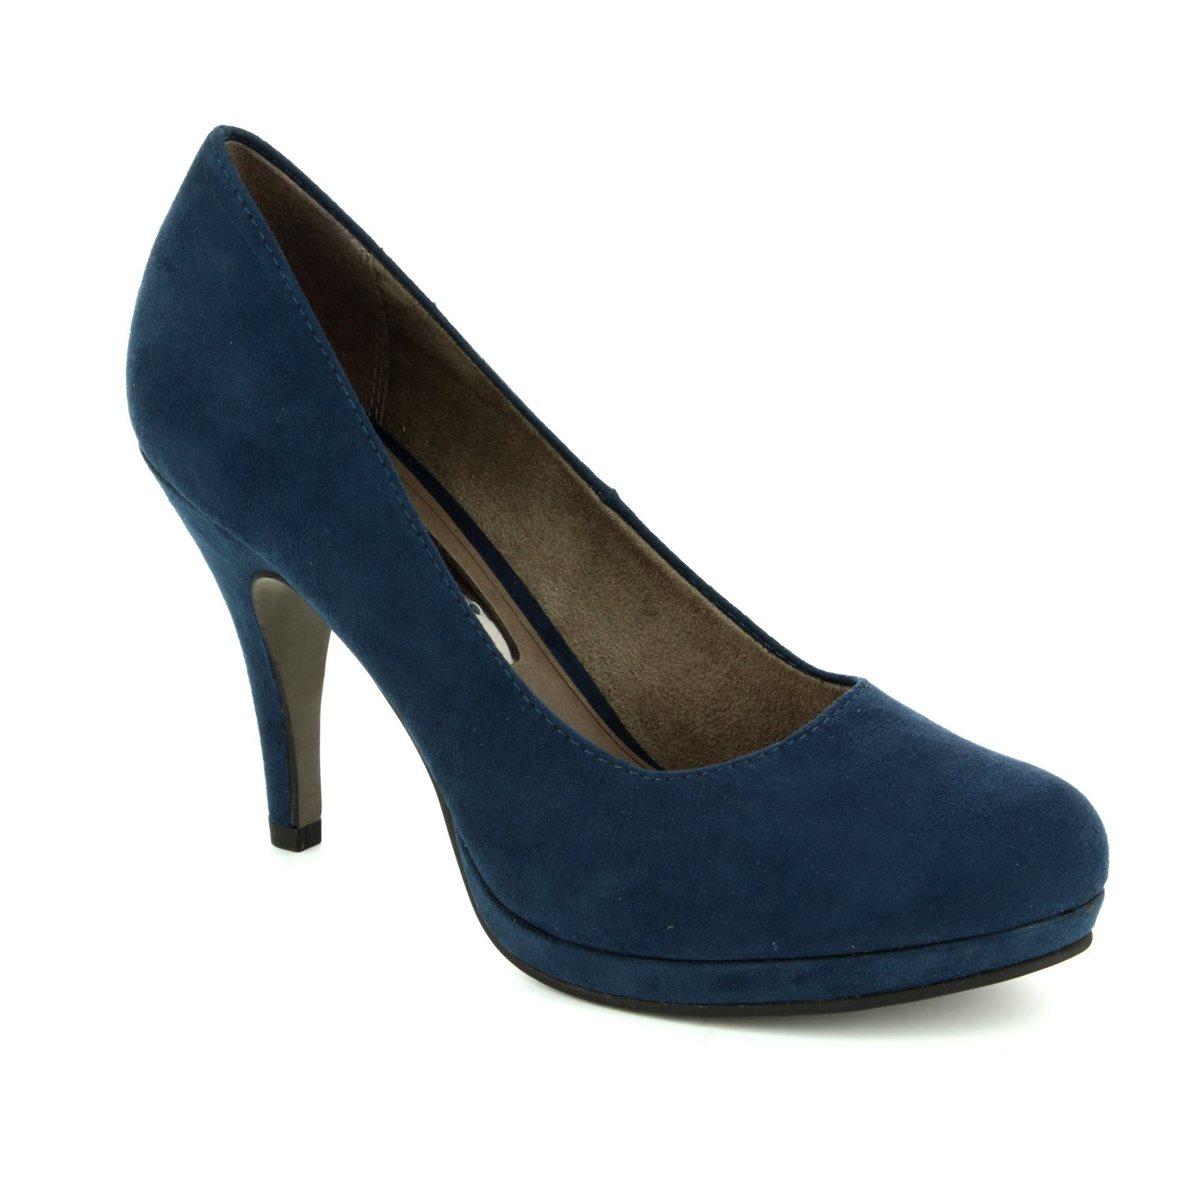 tamaris taggia 22407 805 navy high heeled shoes. Black Bedroom Furniture Sets. Home Design Ideas